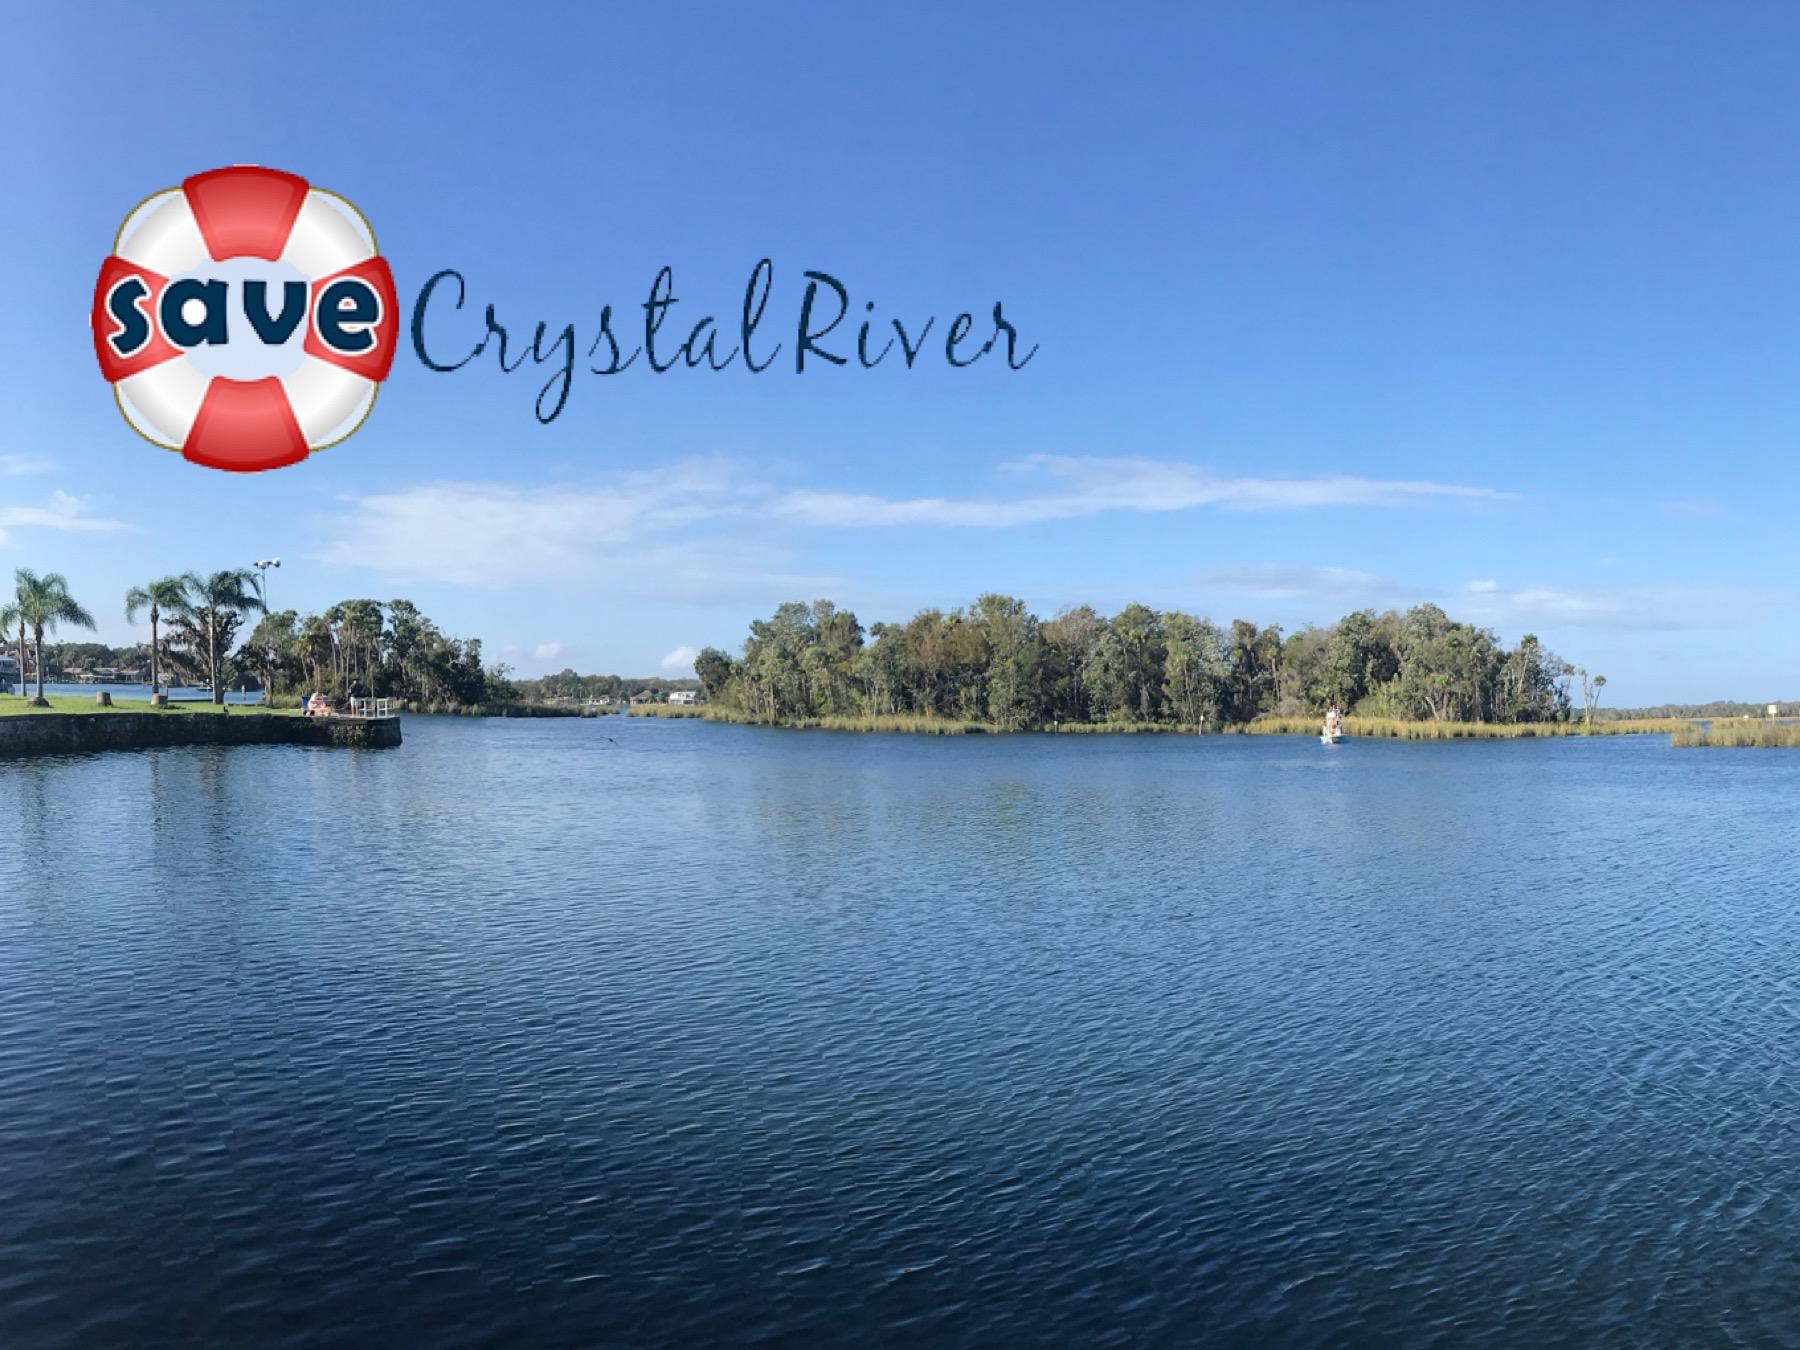 Save Crystal River Logo